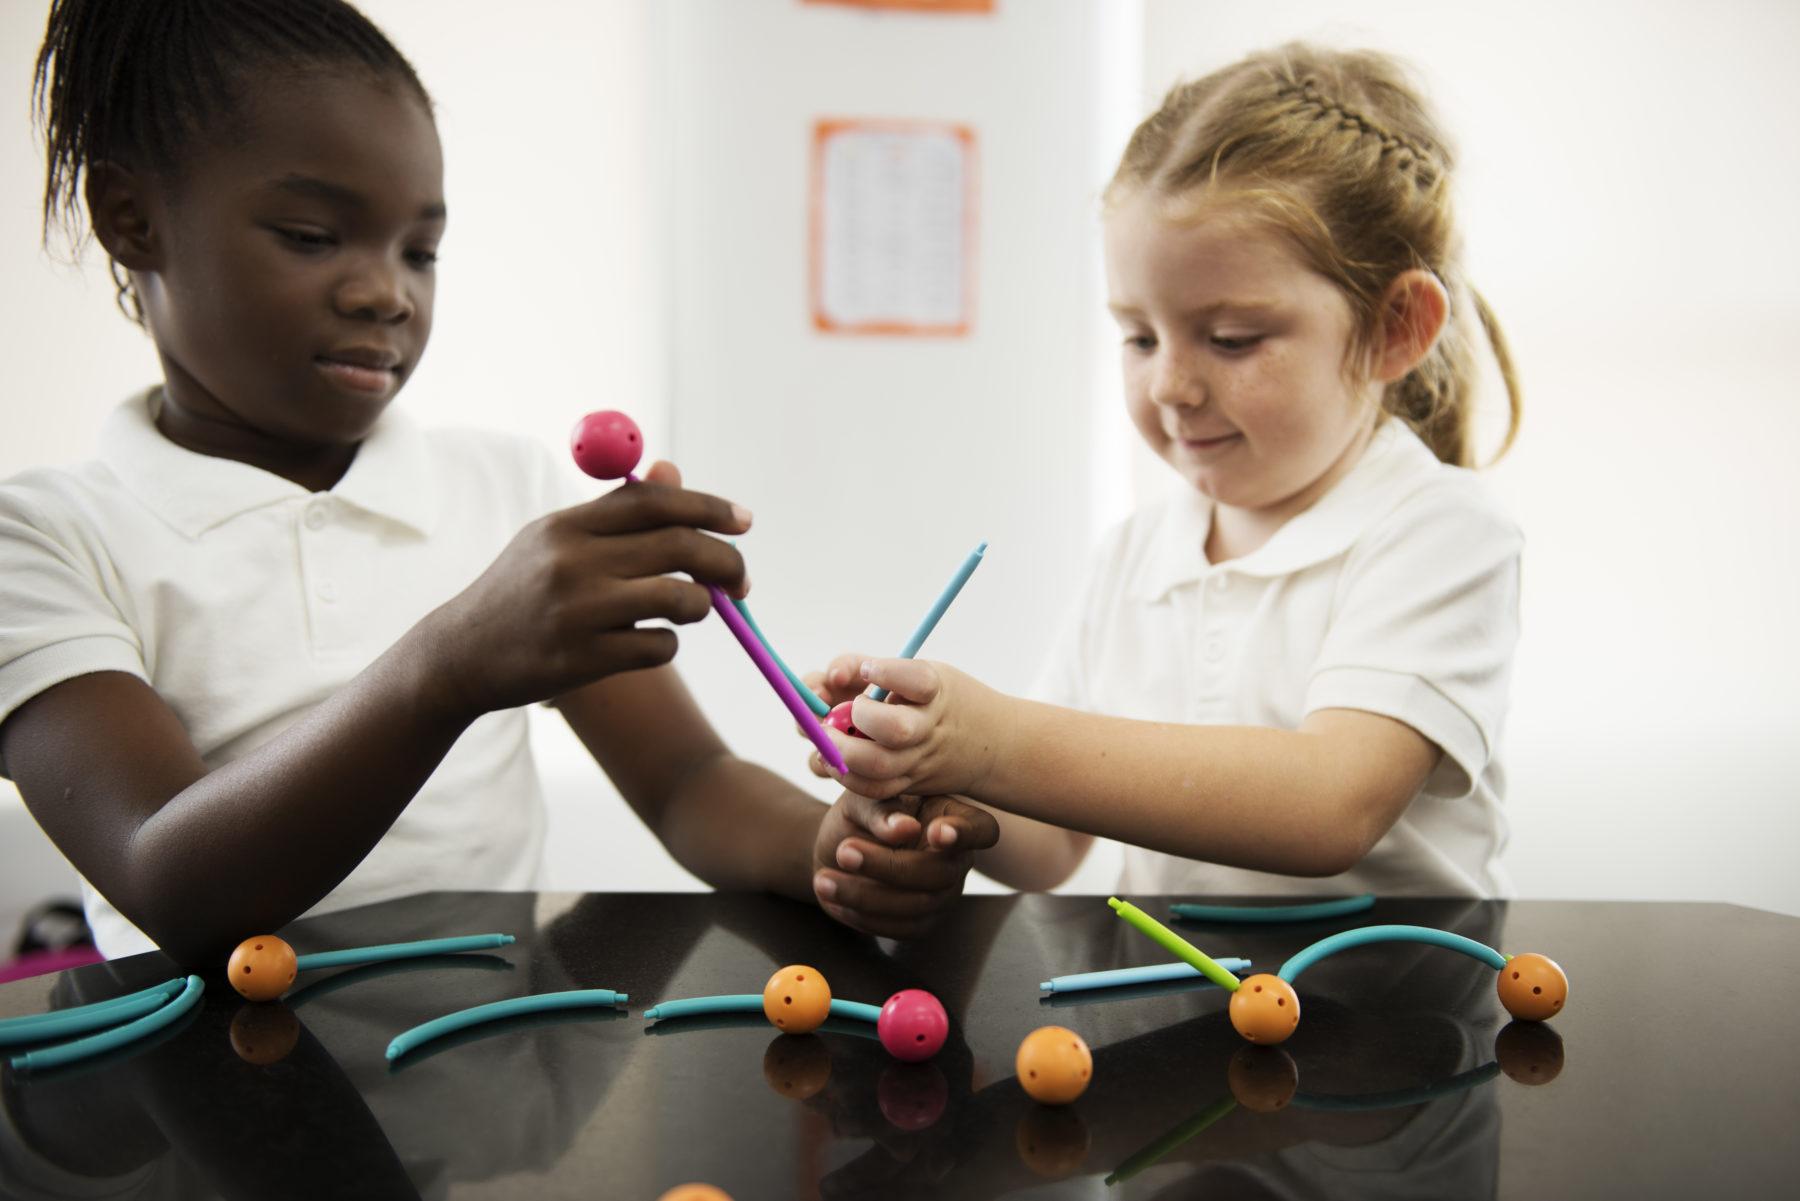 diverse-kindergarten-students-holding-learning-PTA2MMD-1-e1541017847937.jpg